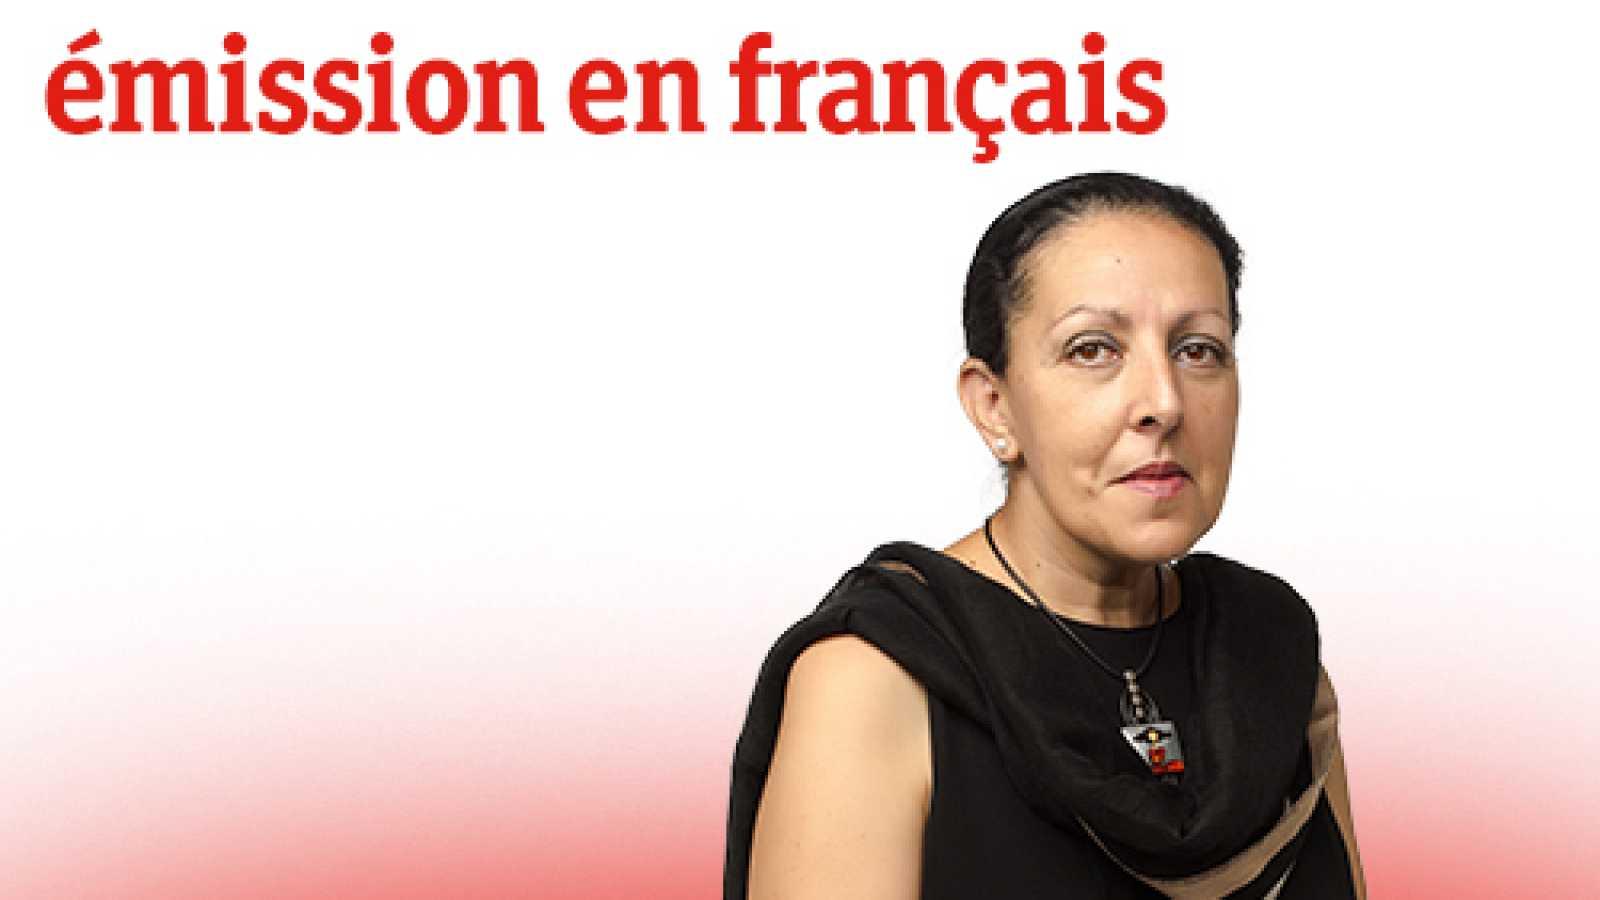 Emission en français - Sahara occidental: la lassitude d'un Peuple - 24/11/20 - escuchar ahora